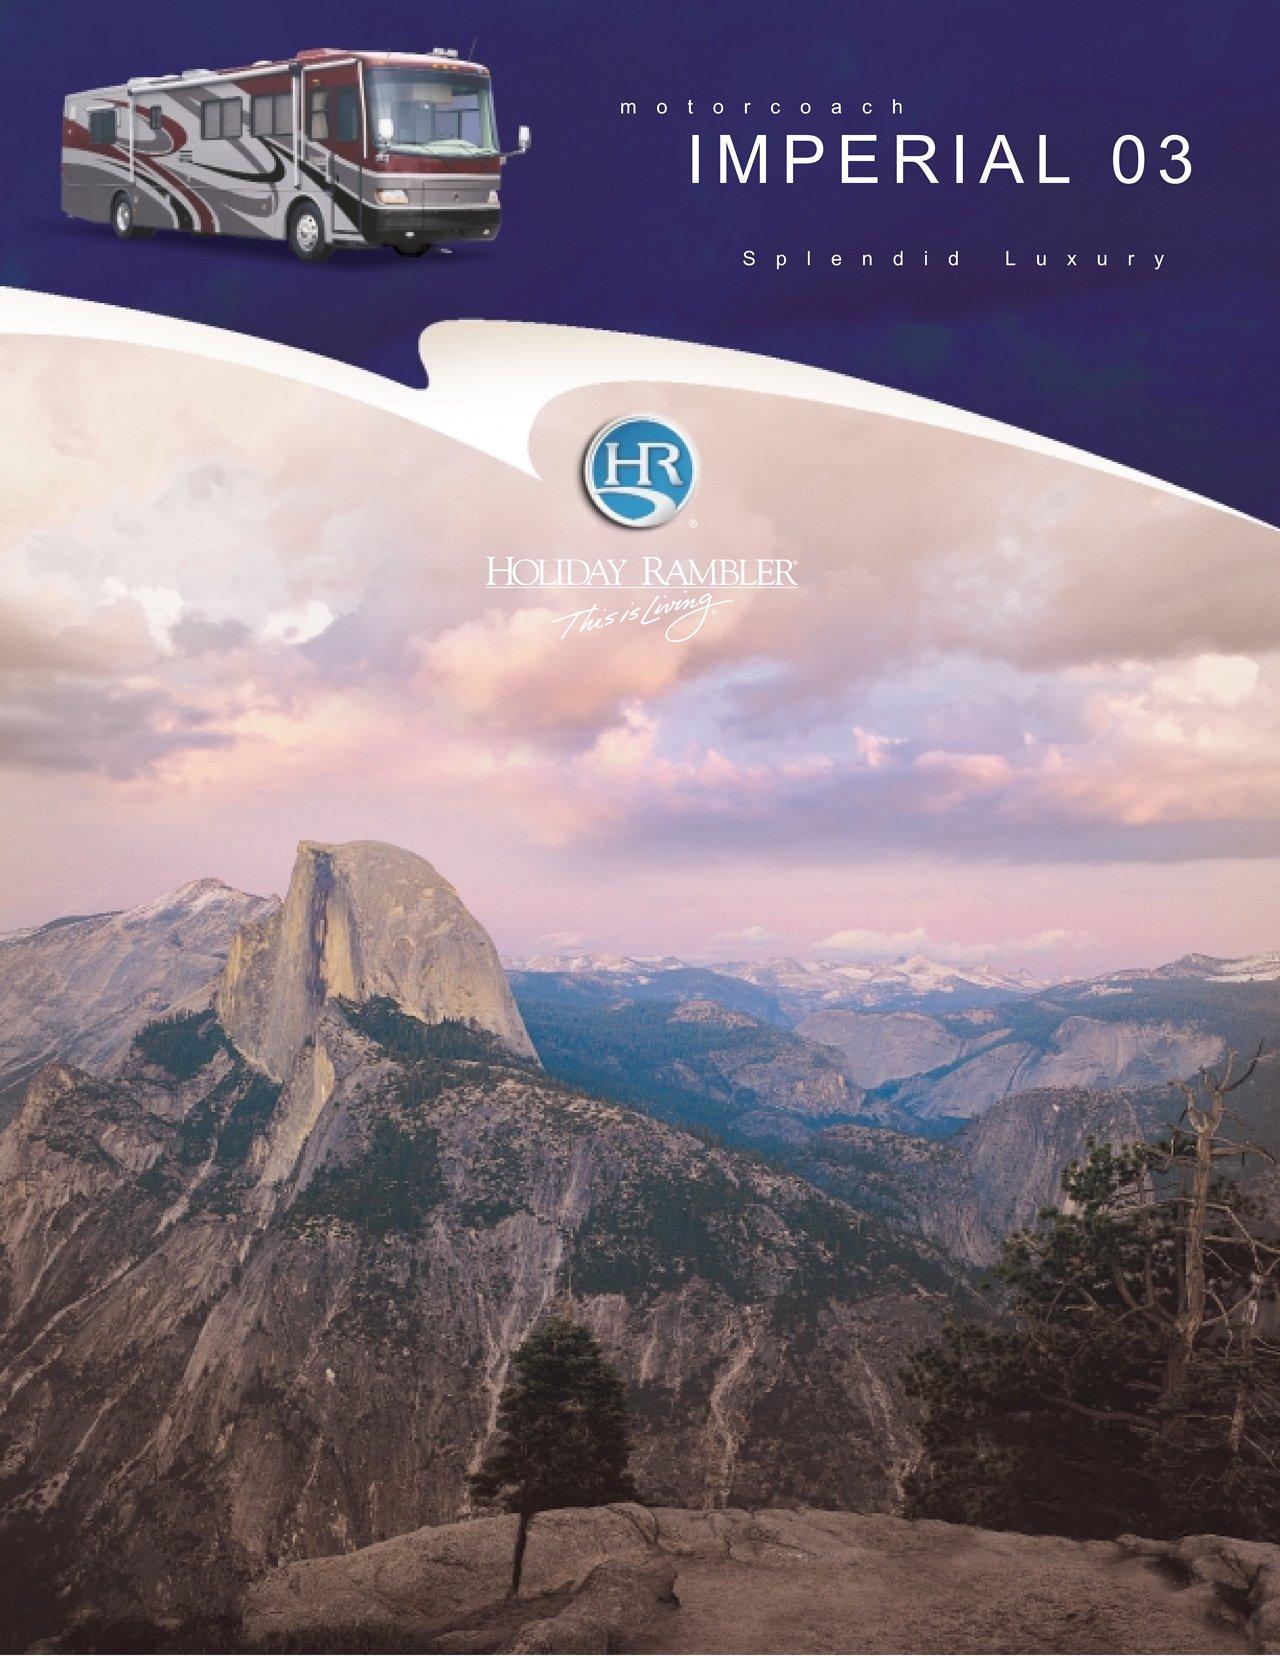 View Holiday Rambler Imperial Brochures | RV brochures download